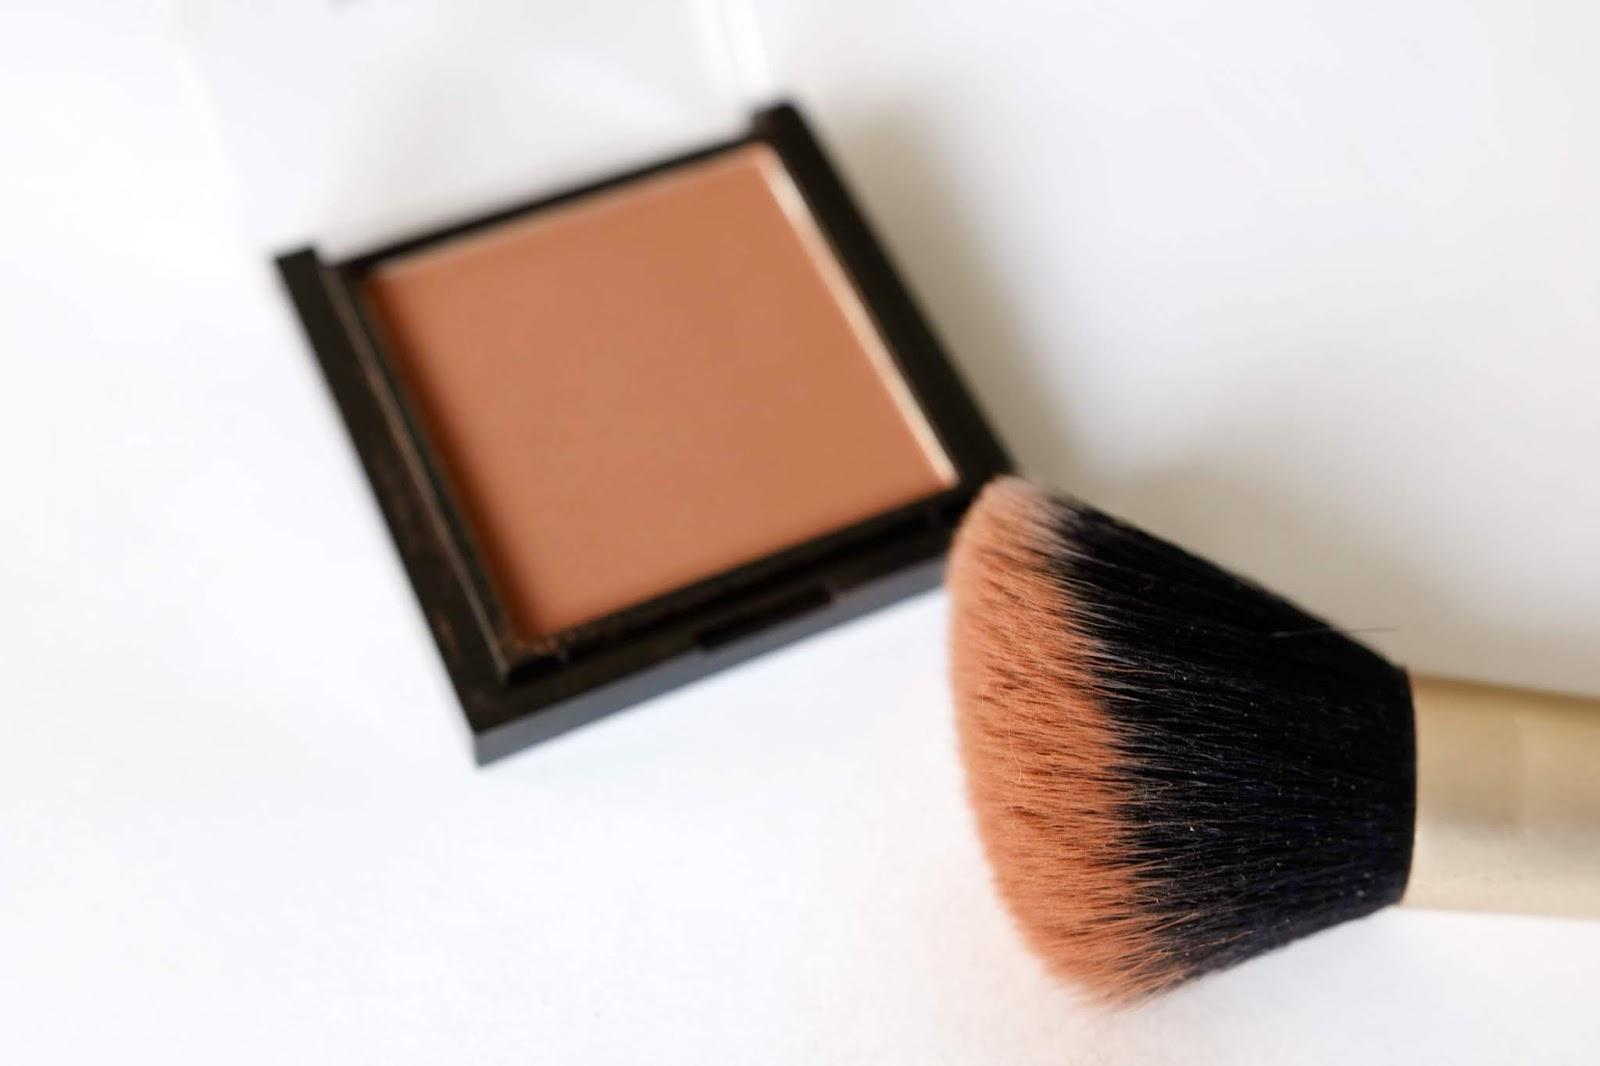 Morphe bronzer contour makeup beauty guru ipsy review brush